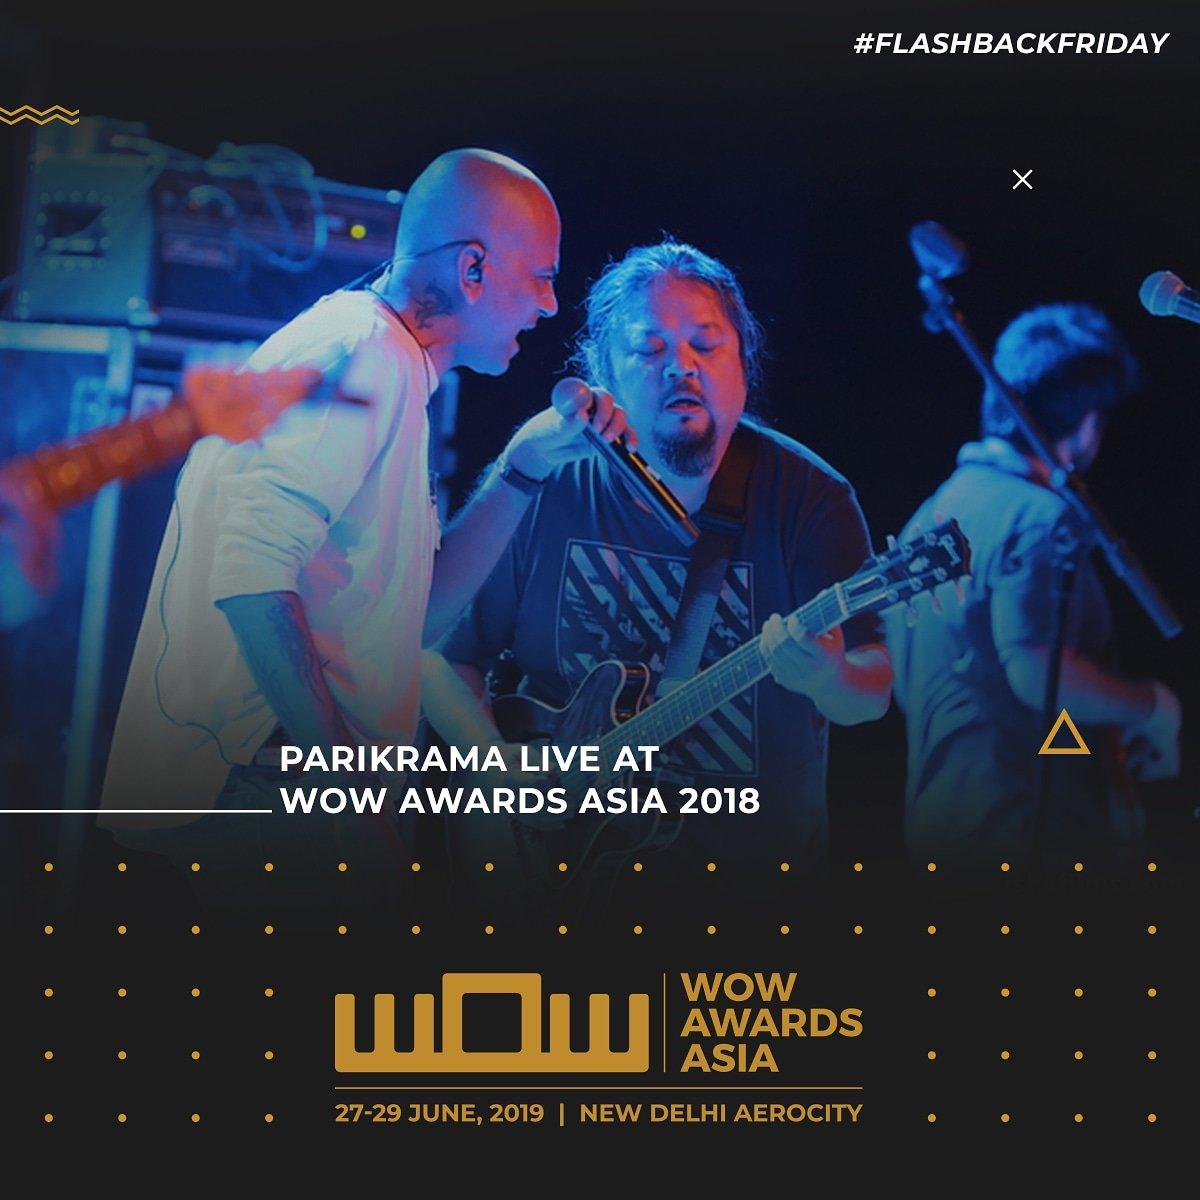 WOW Awards Asia (@WOWAwardsAsia) | טוויטר